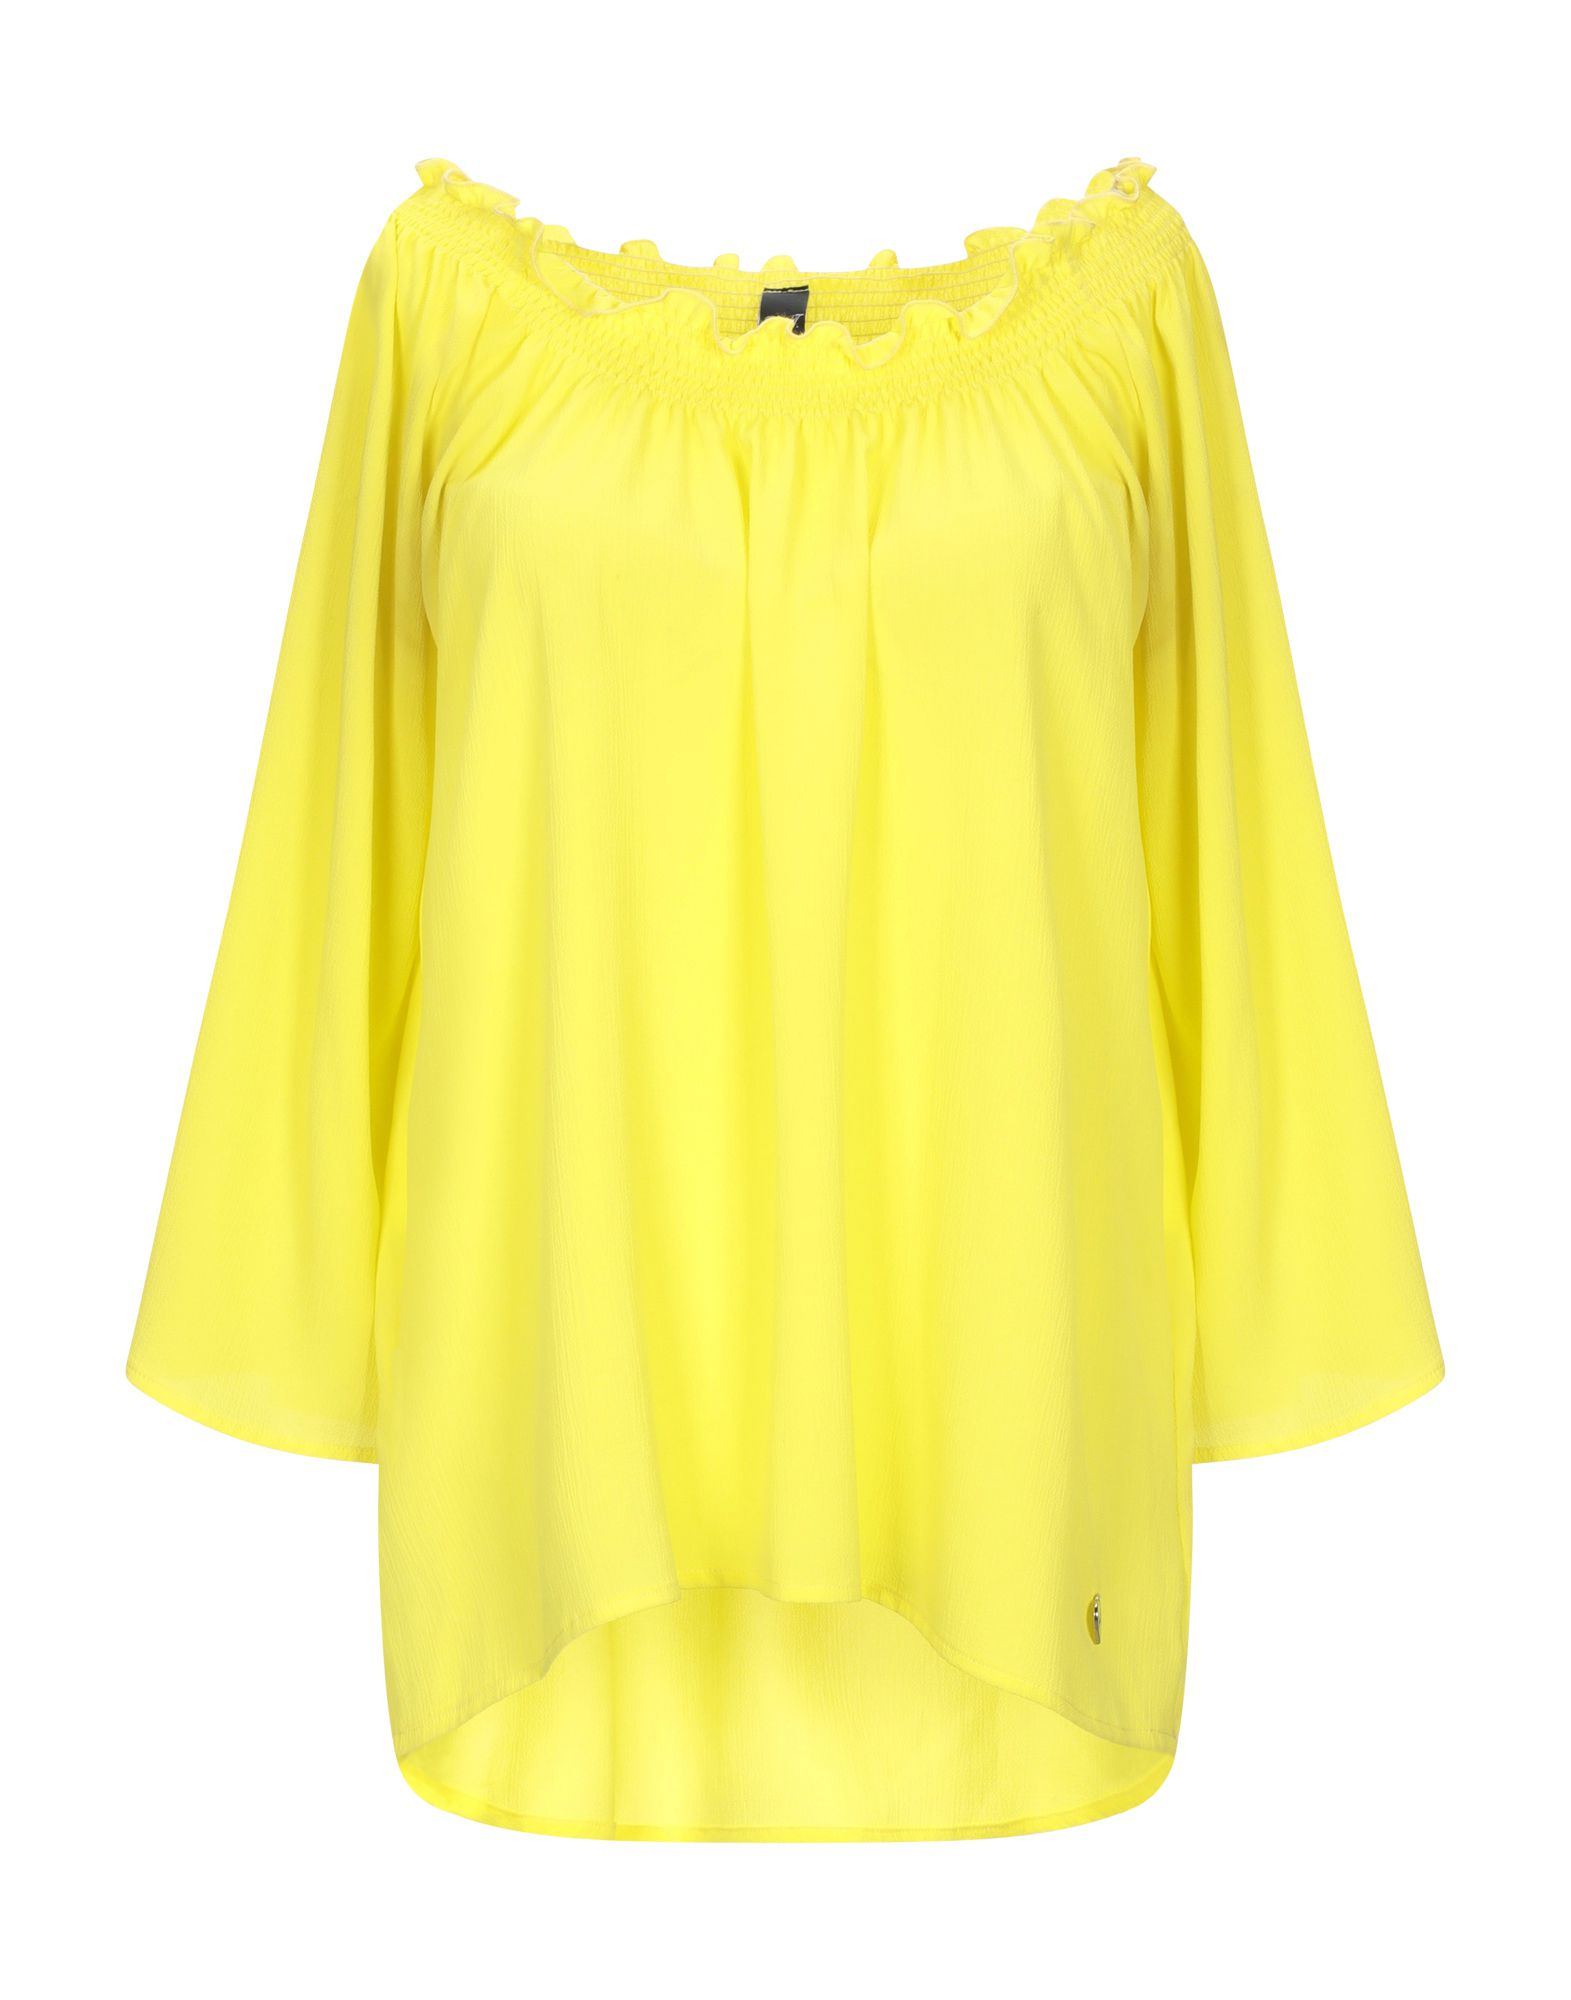 PAOLA T. Блузка блузка t tahari блузка